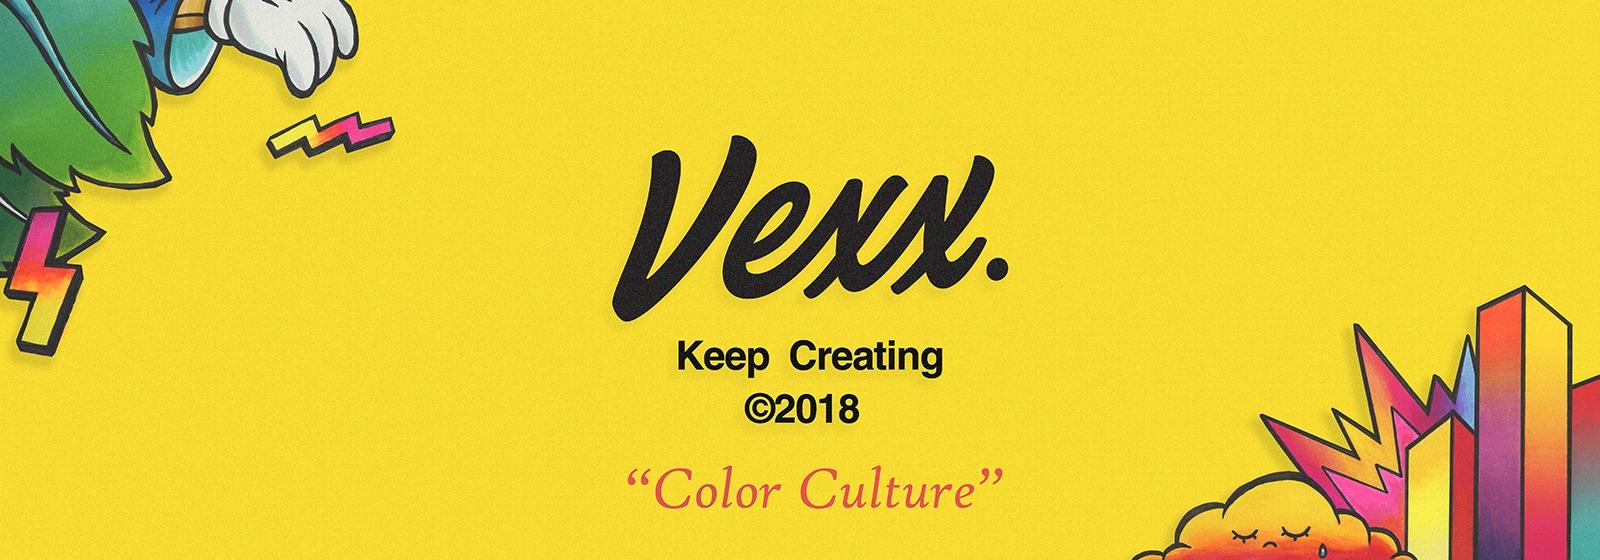 Vexx | Keep Creating Store